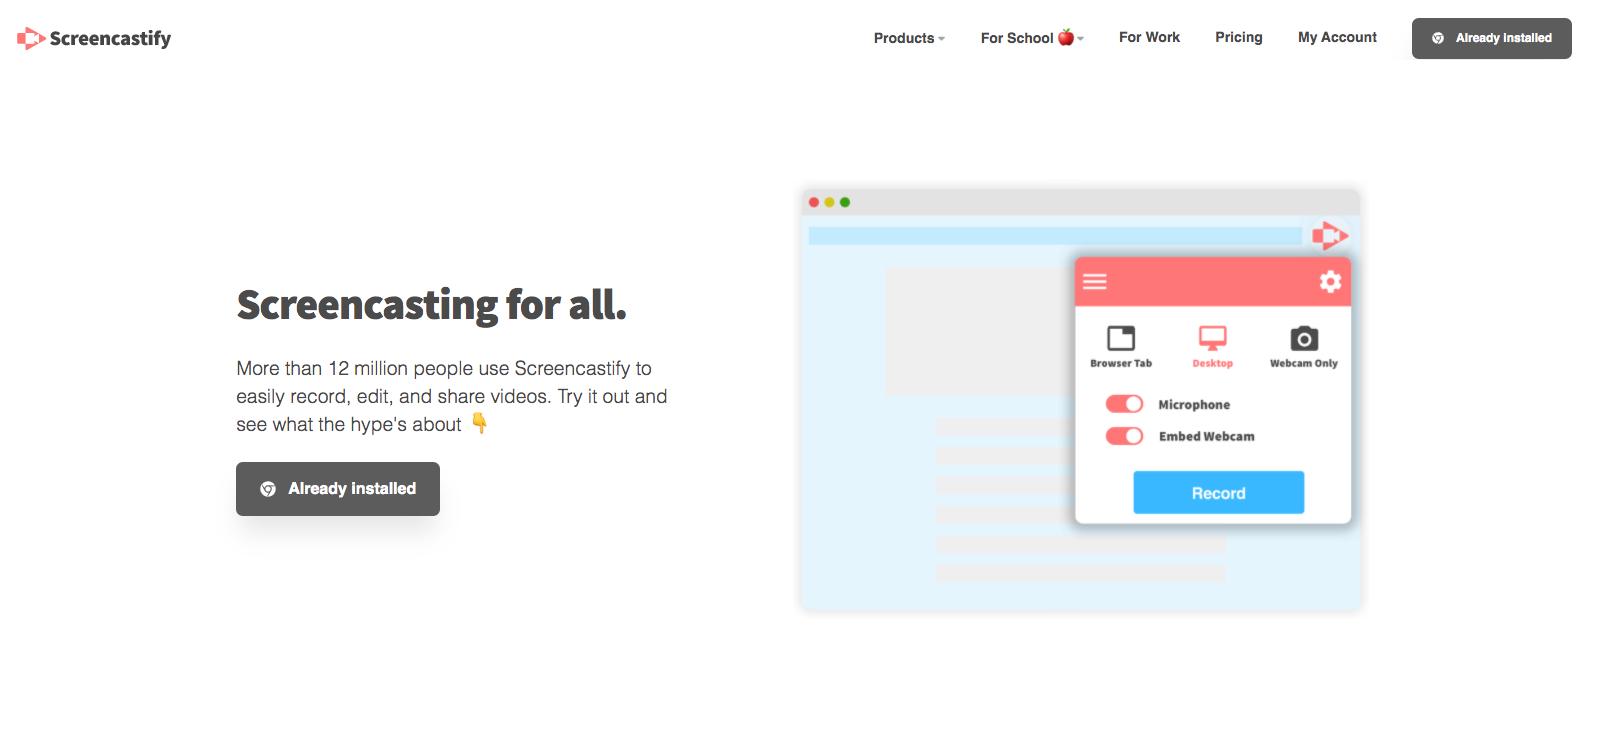 screencastify smart work